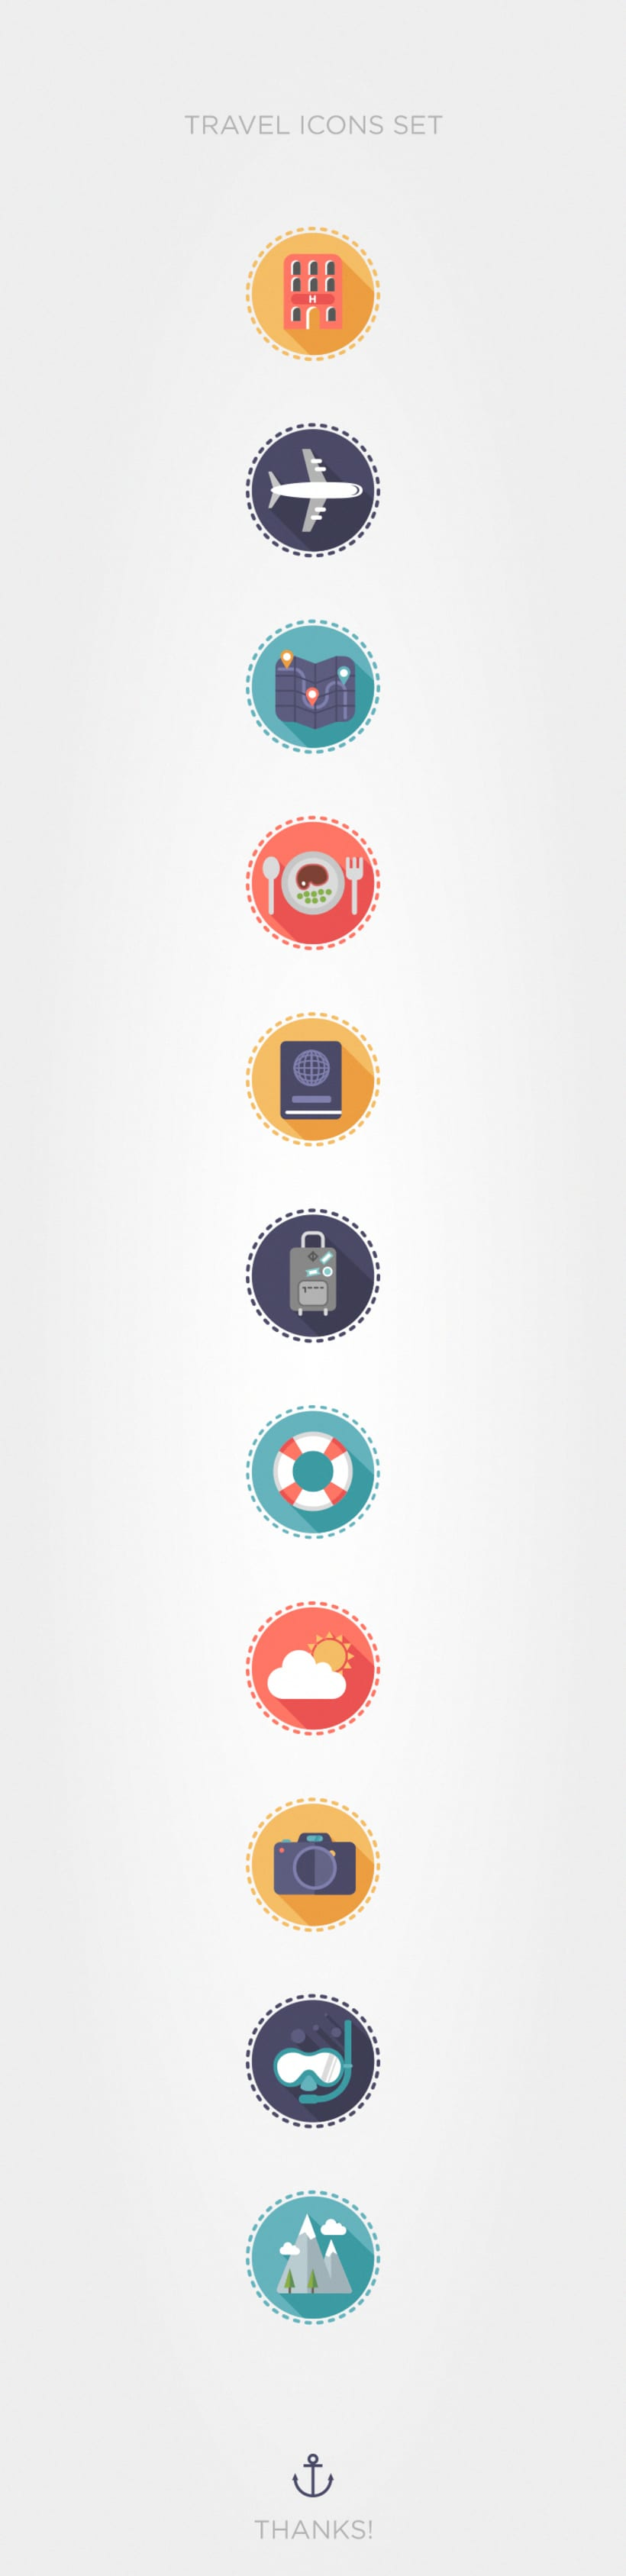 Travel icons set -1